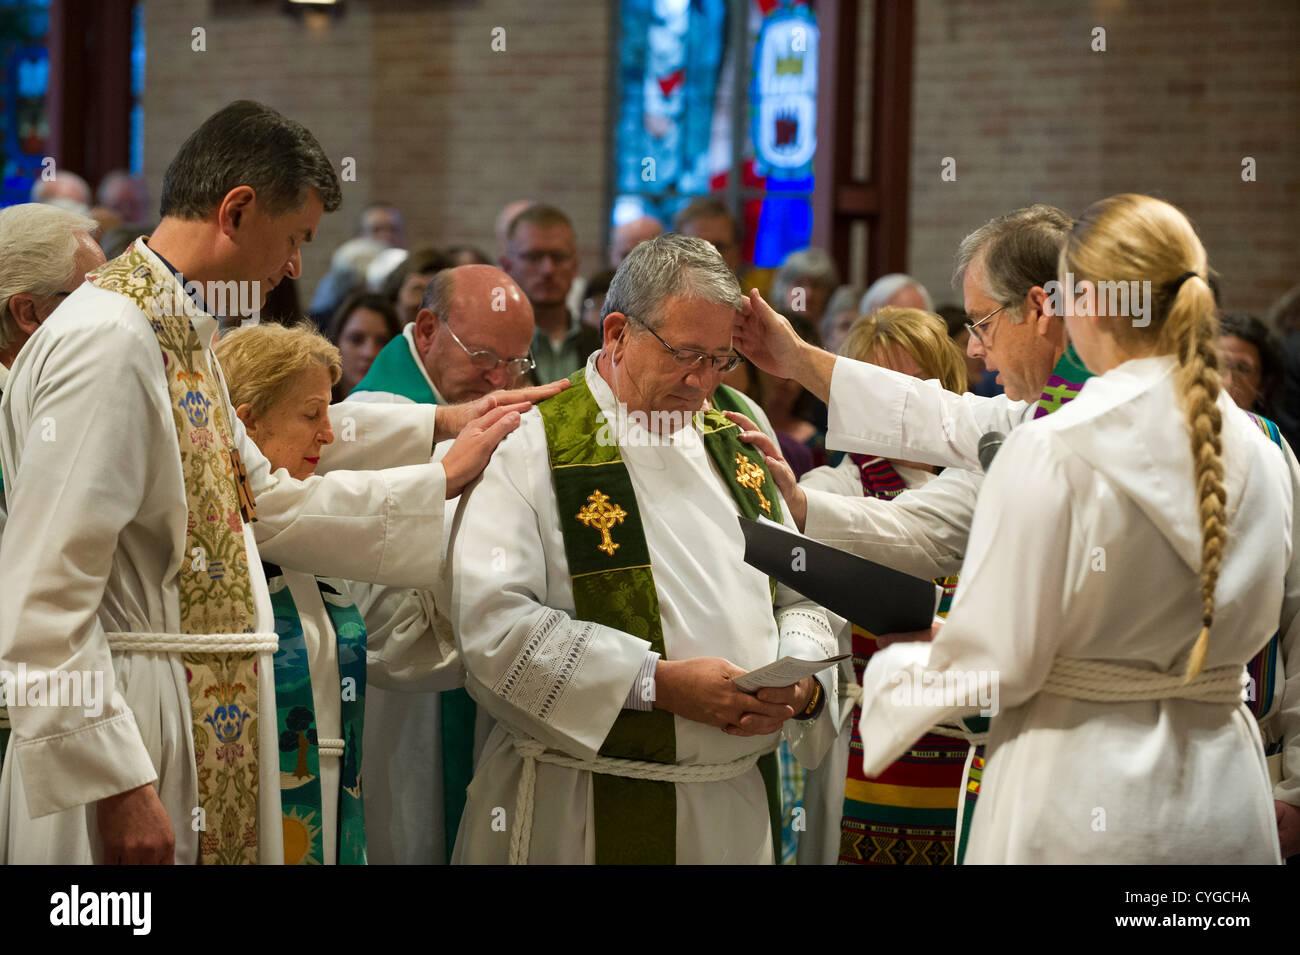 Fellow pastors bless Rev. Peder Sandager during his installation ceremony as senior pastor at St. Martin's Lutheran - Stock Image